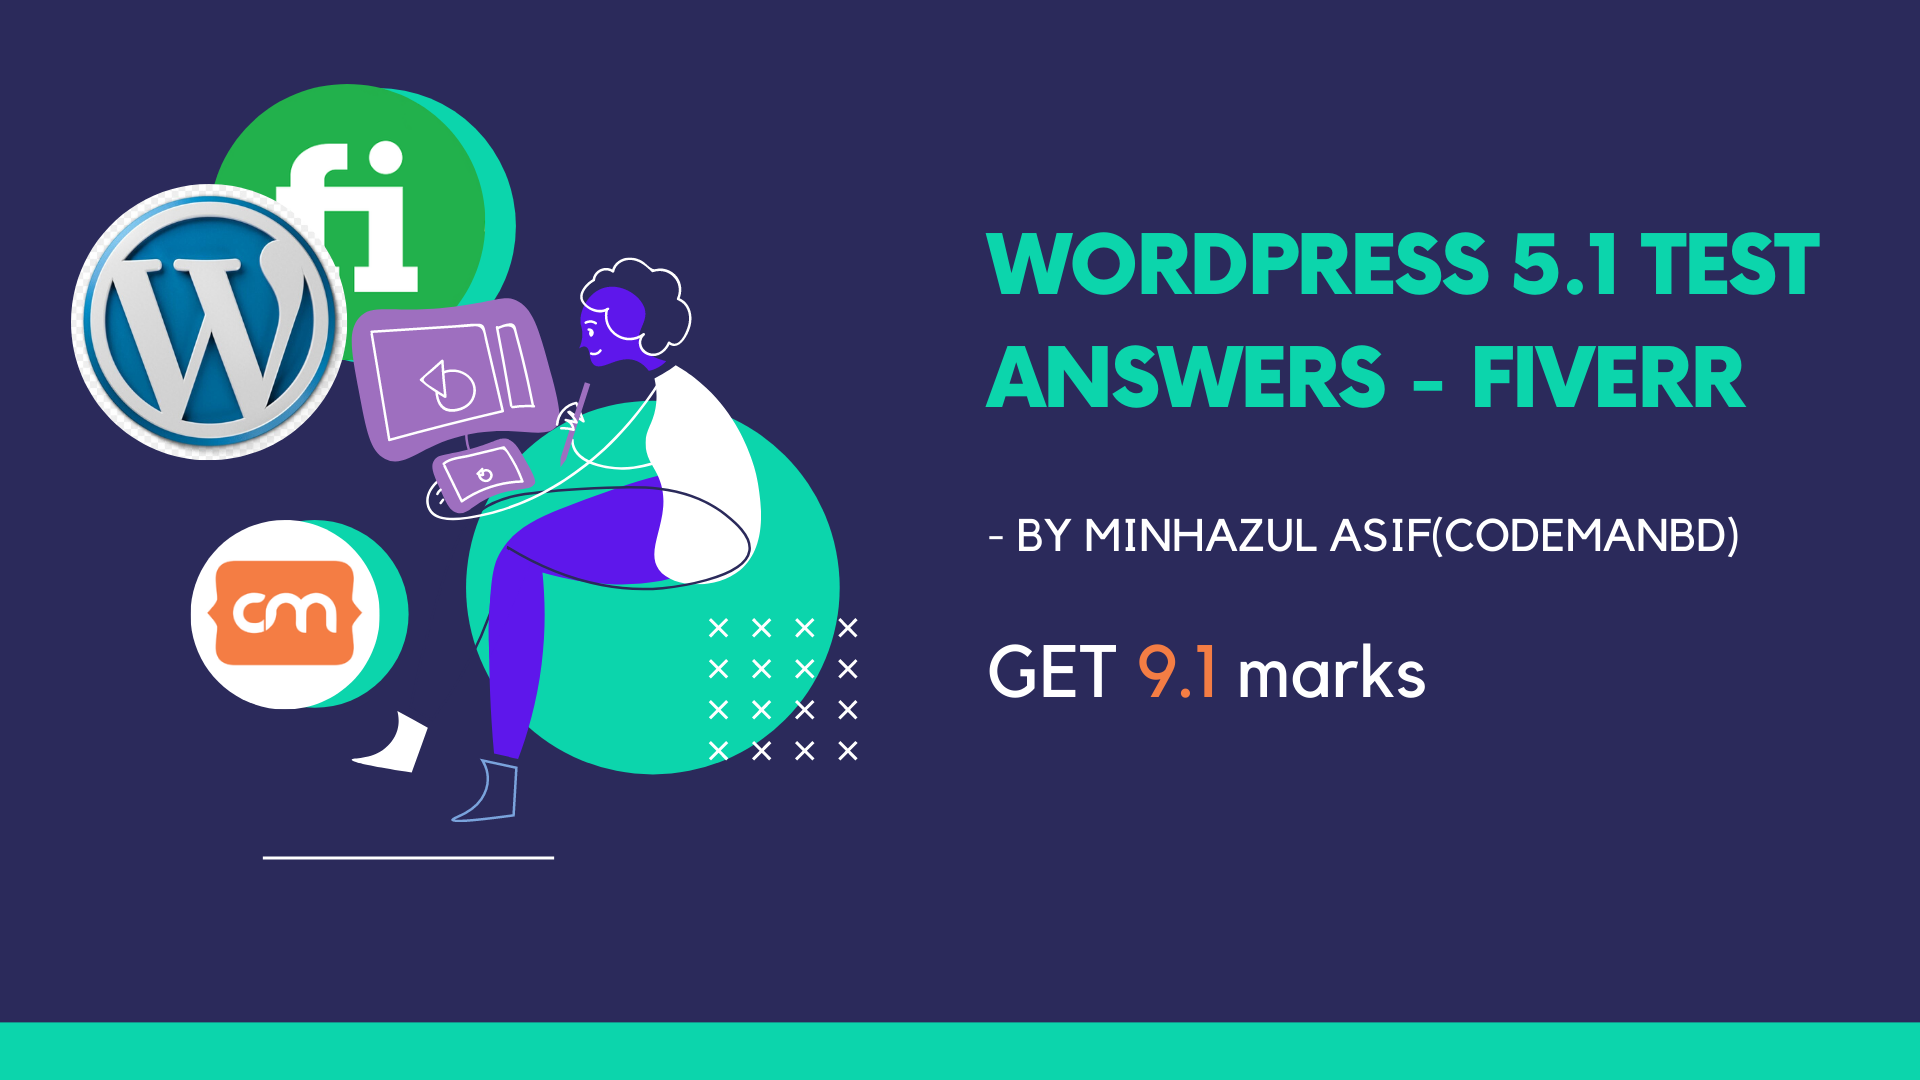 wordpress 5.1 test answer - fiverr